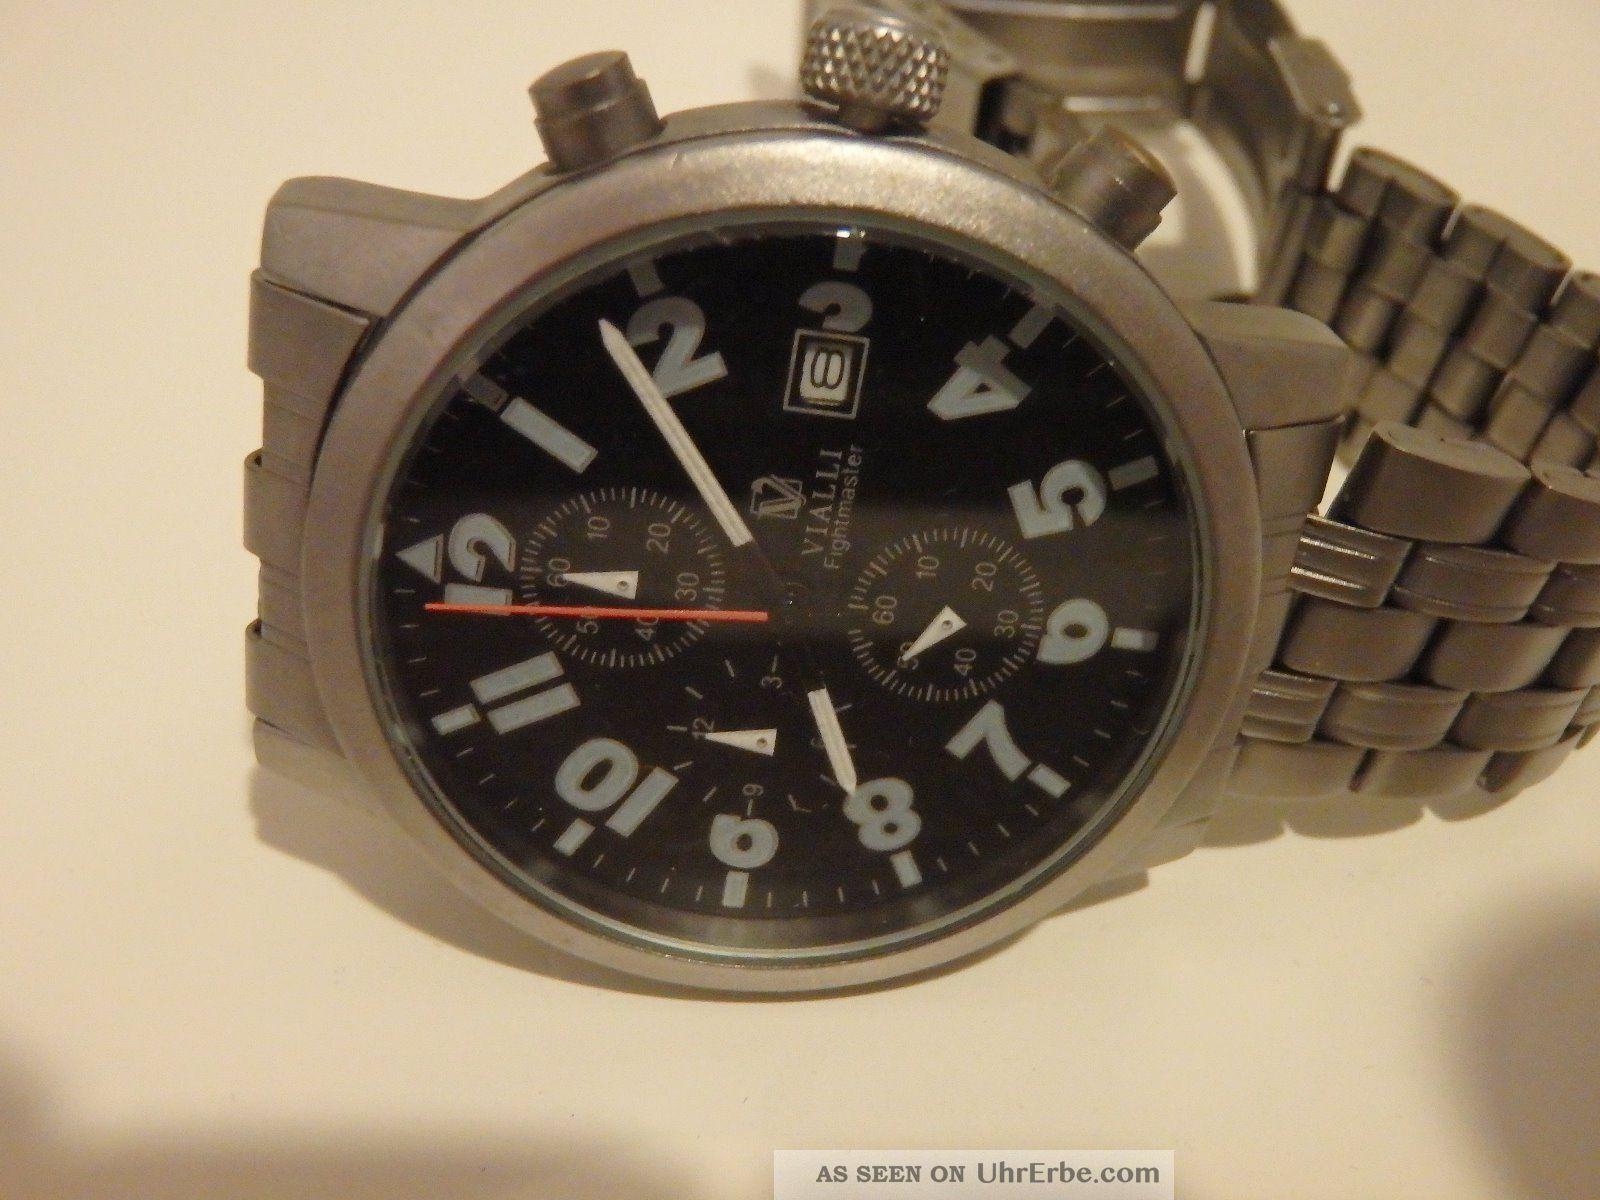 vialli chronograph herrenuhr metallarmband schwarzes zifferblatt. Black Bedroom Furniture Sets. Home Design Ideas